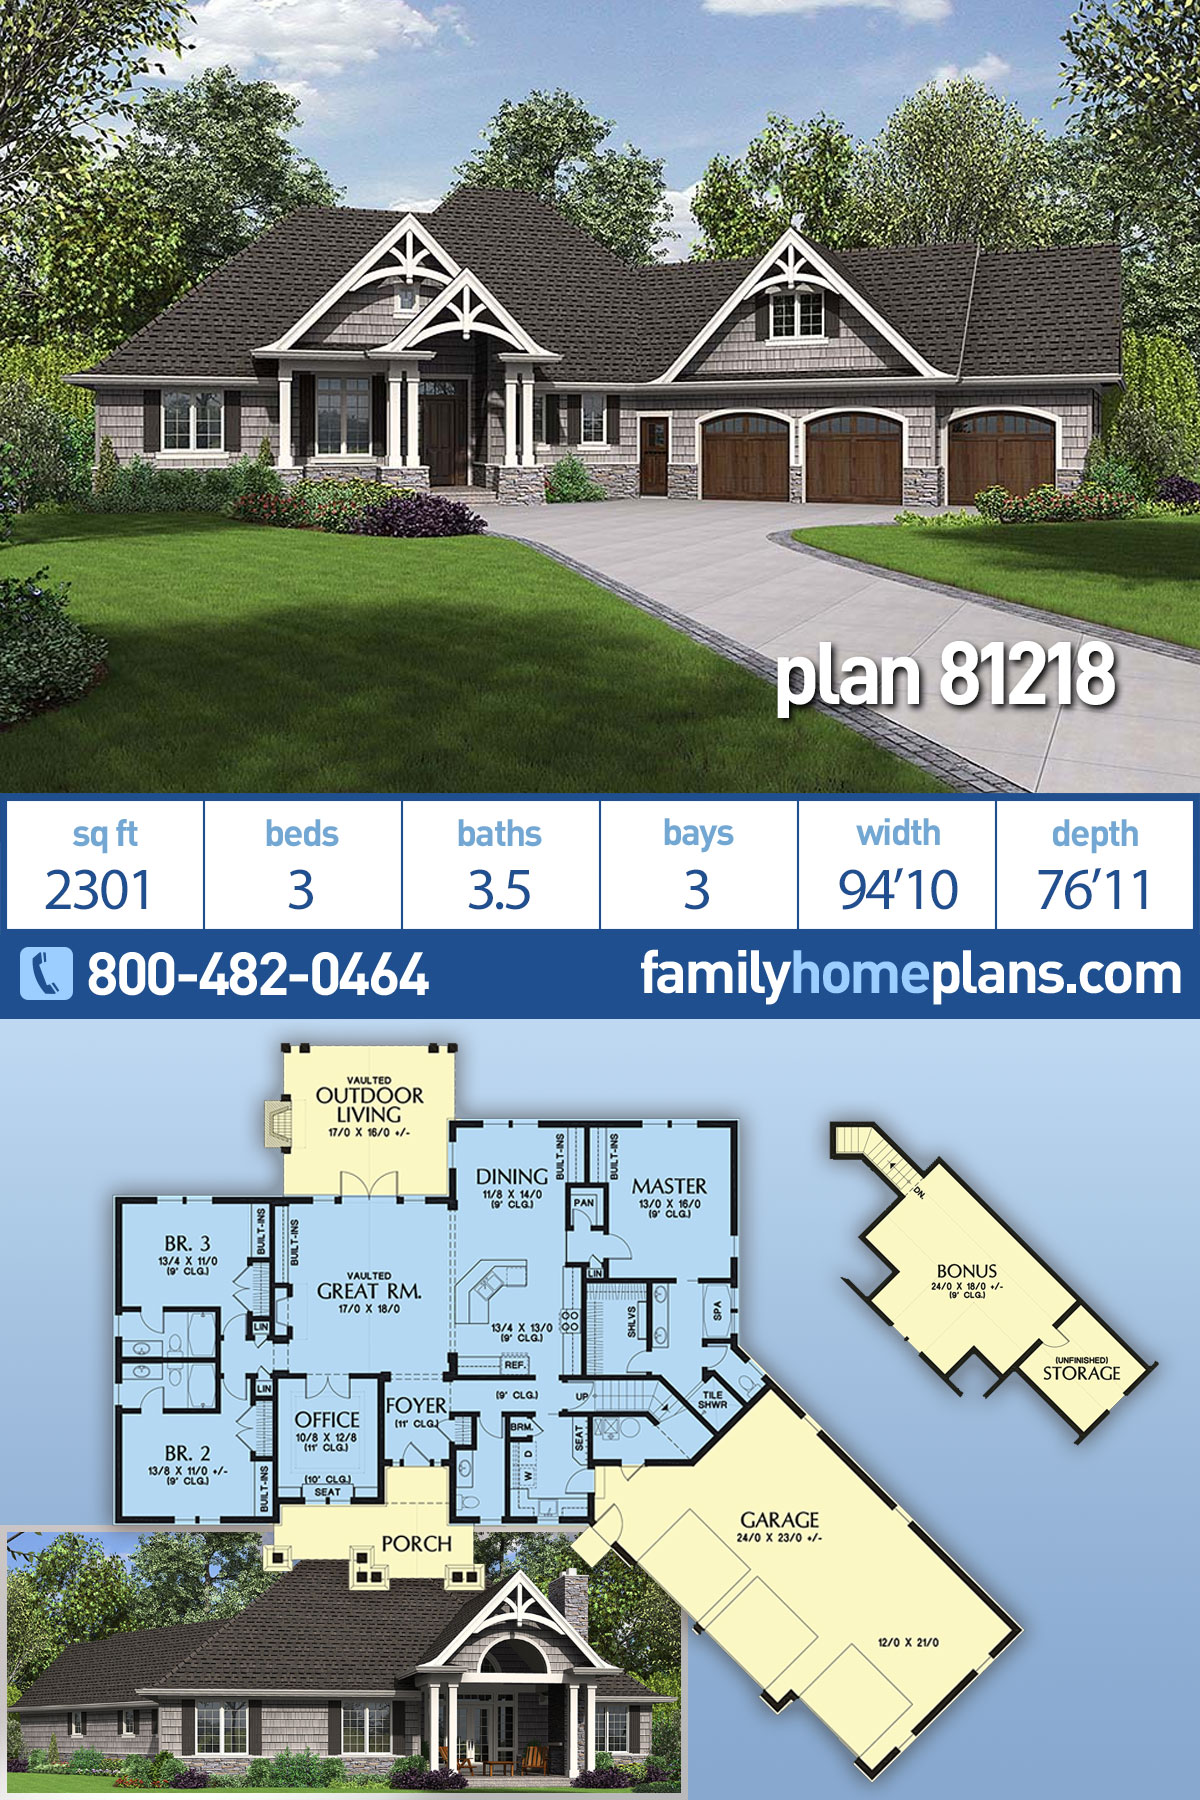 Craftsman House Plan 81218 with 3 Beds, 4 Baths, 3 Car Garage